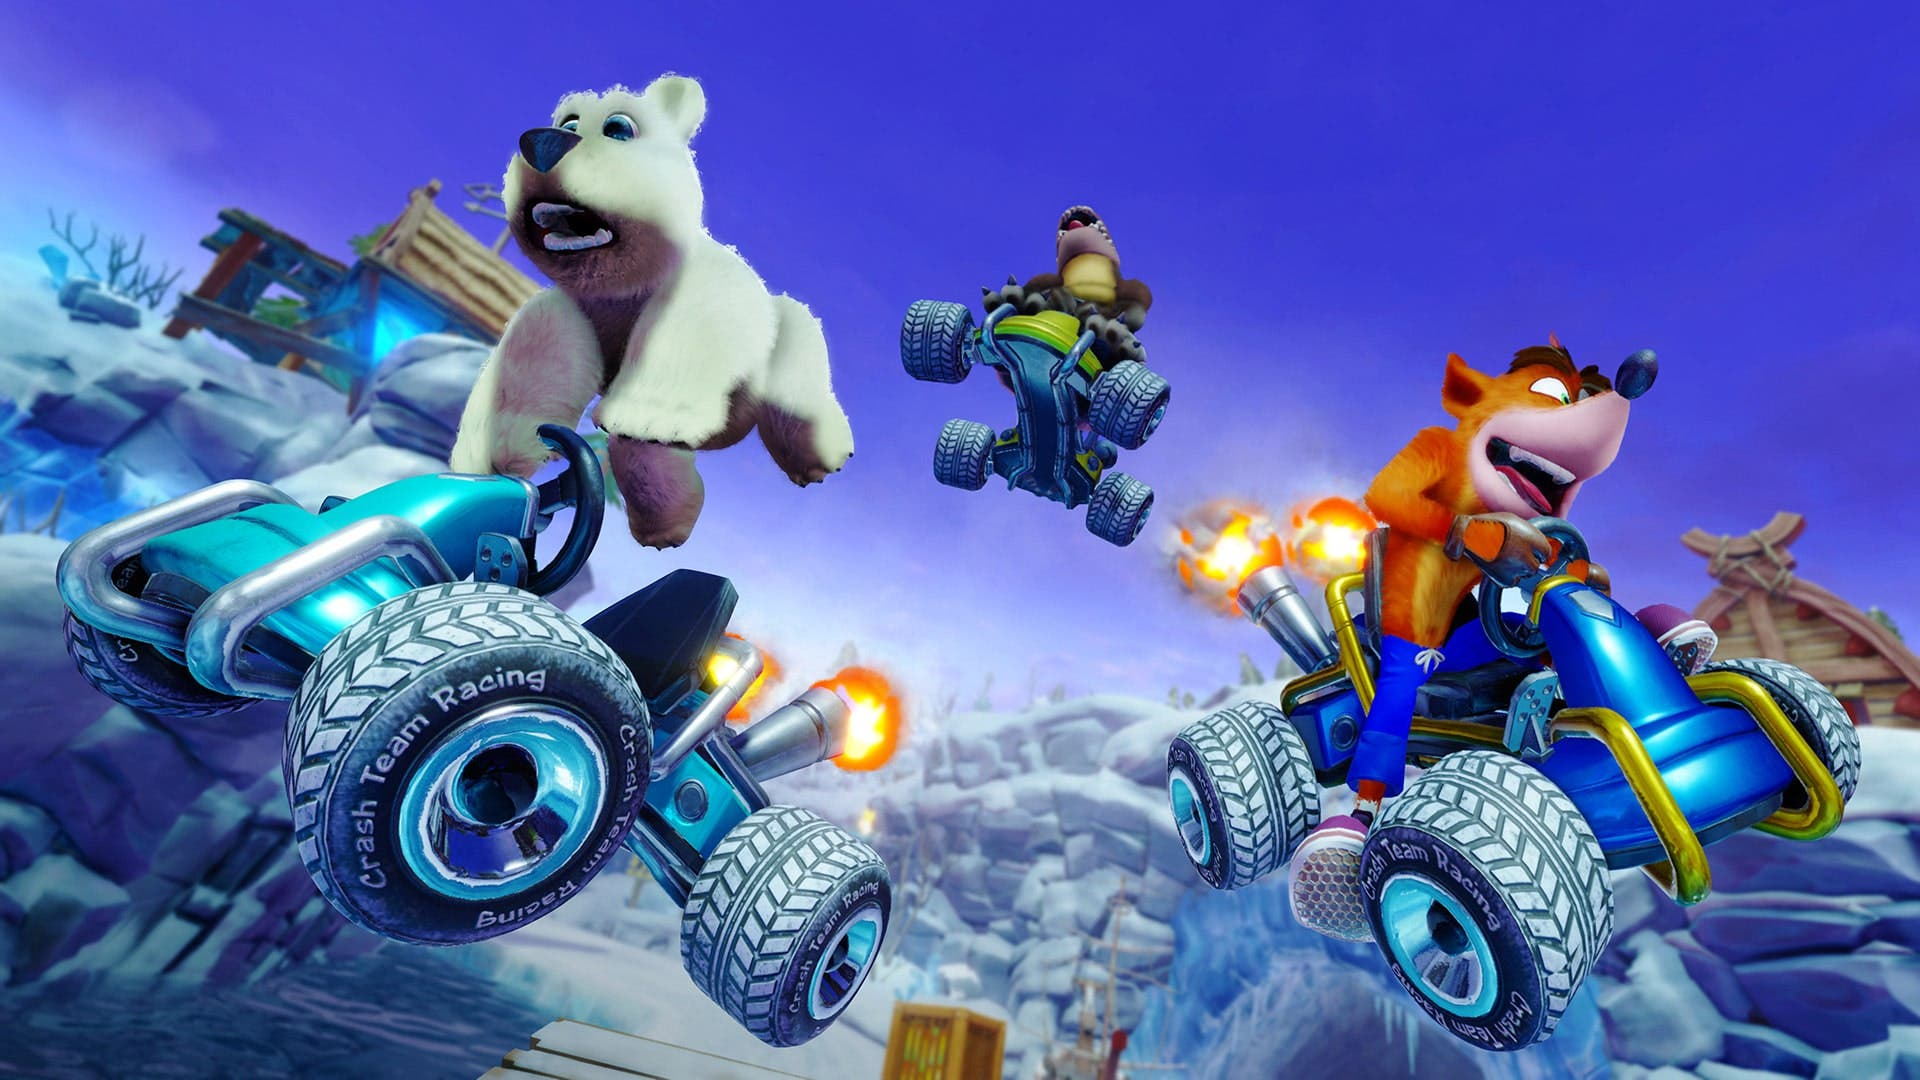 Crash Team Racing Nitro-Fueled Screen 1-min